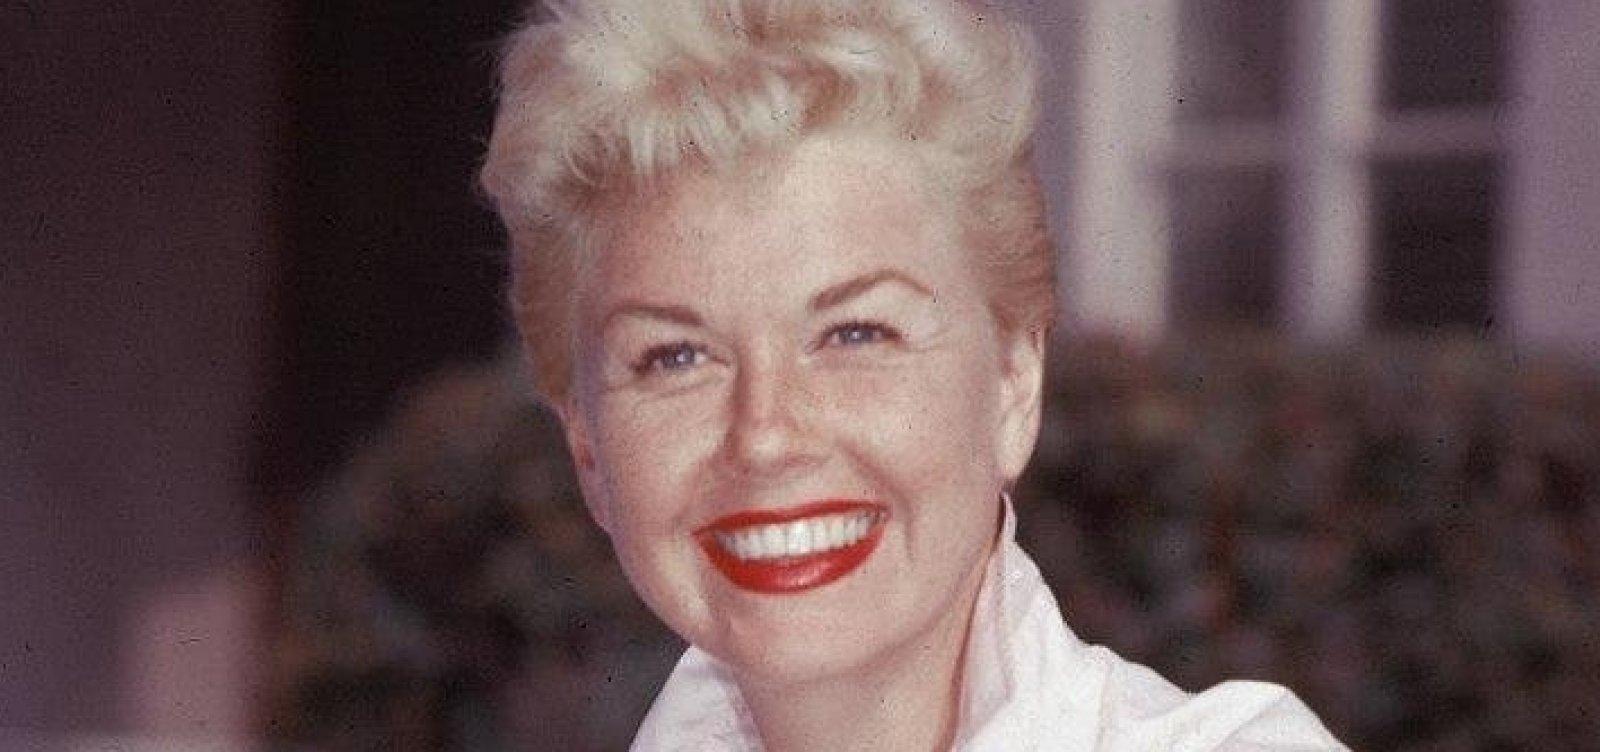 [Atriz e cantora Doris Day morre aos 97 anos nos Estados Unidos]